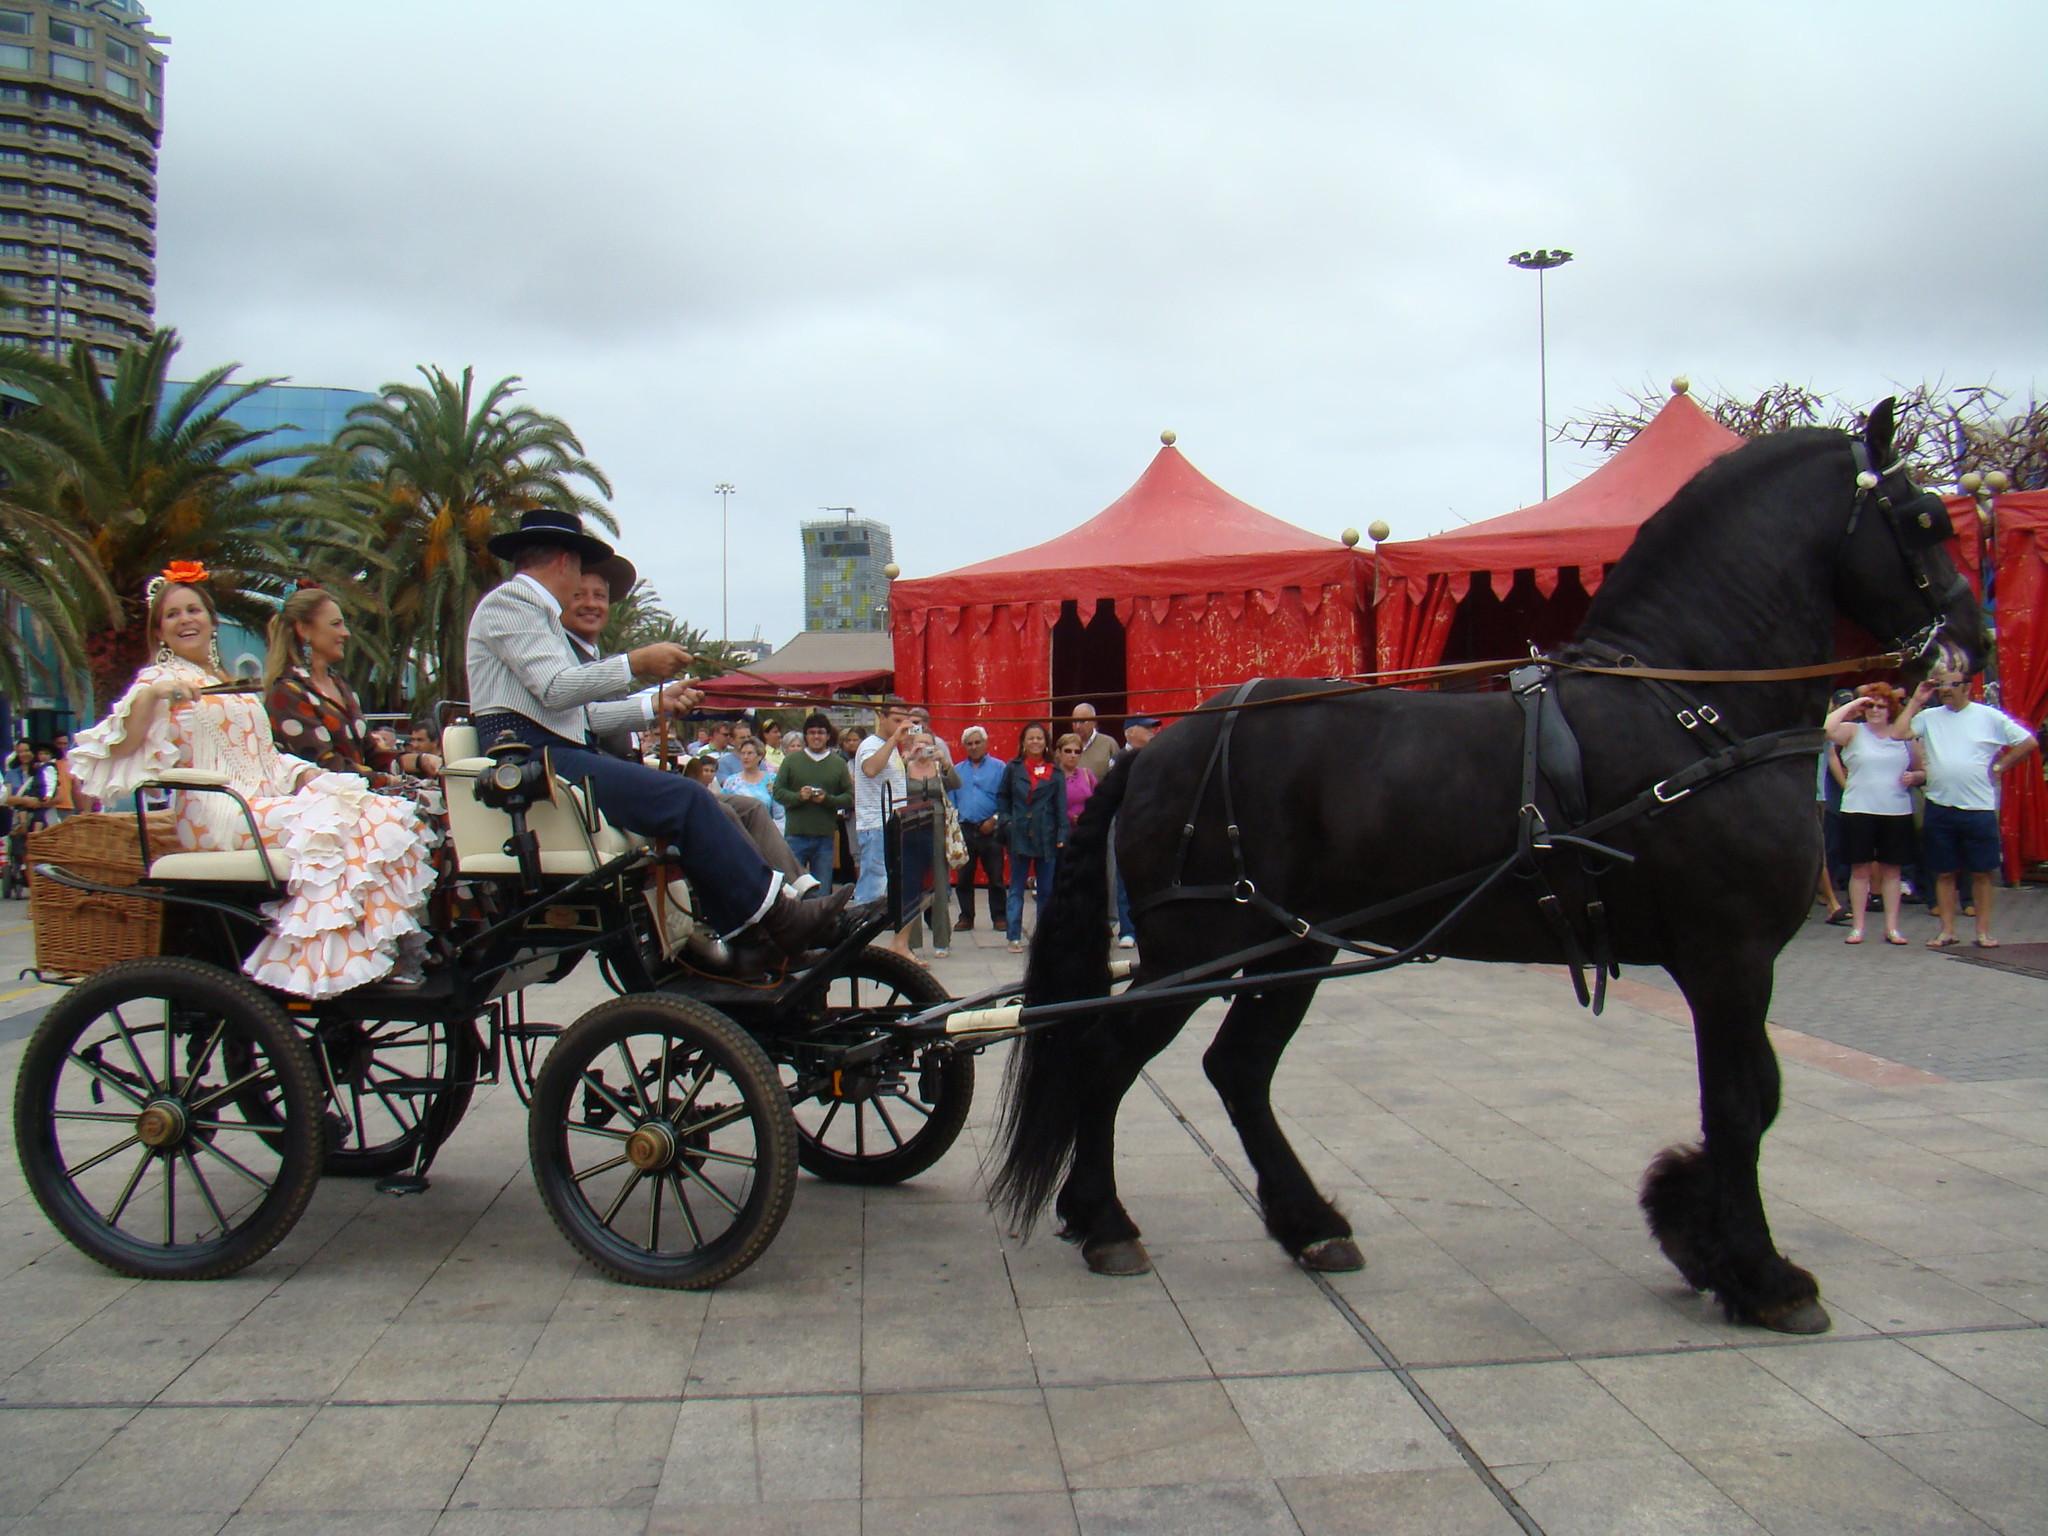 carreta de caballos II Feria de abril Las Palmas Gran Canaria